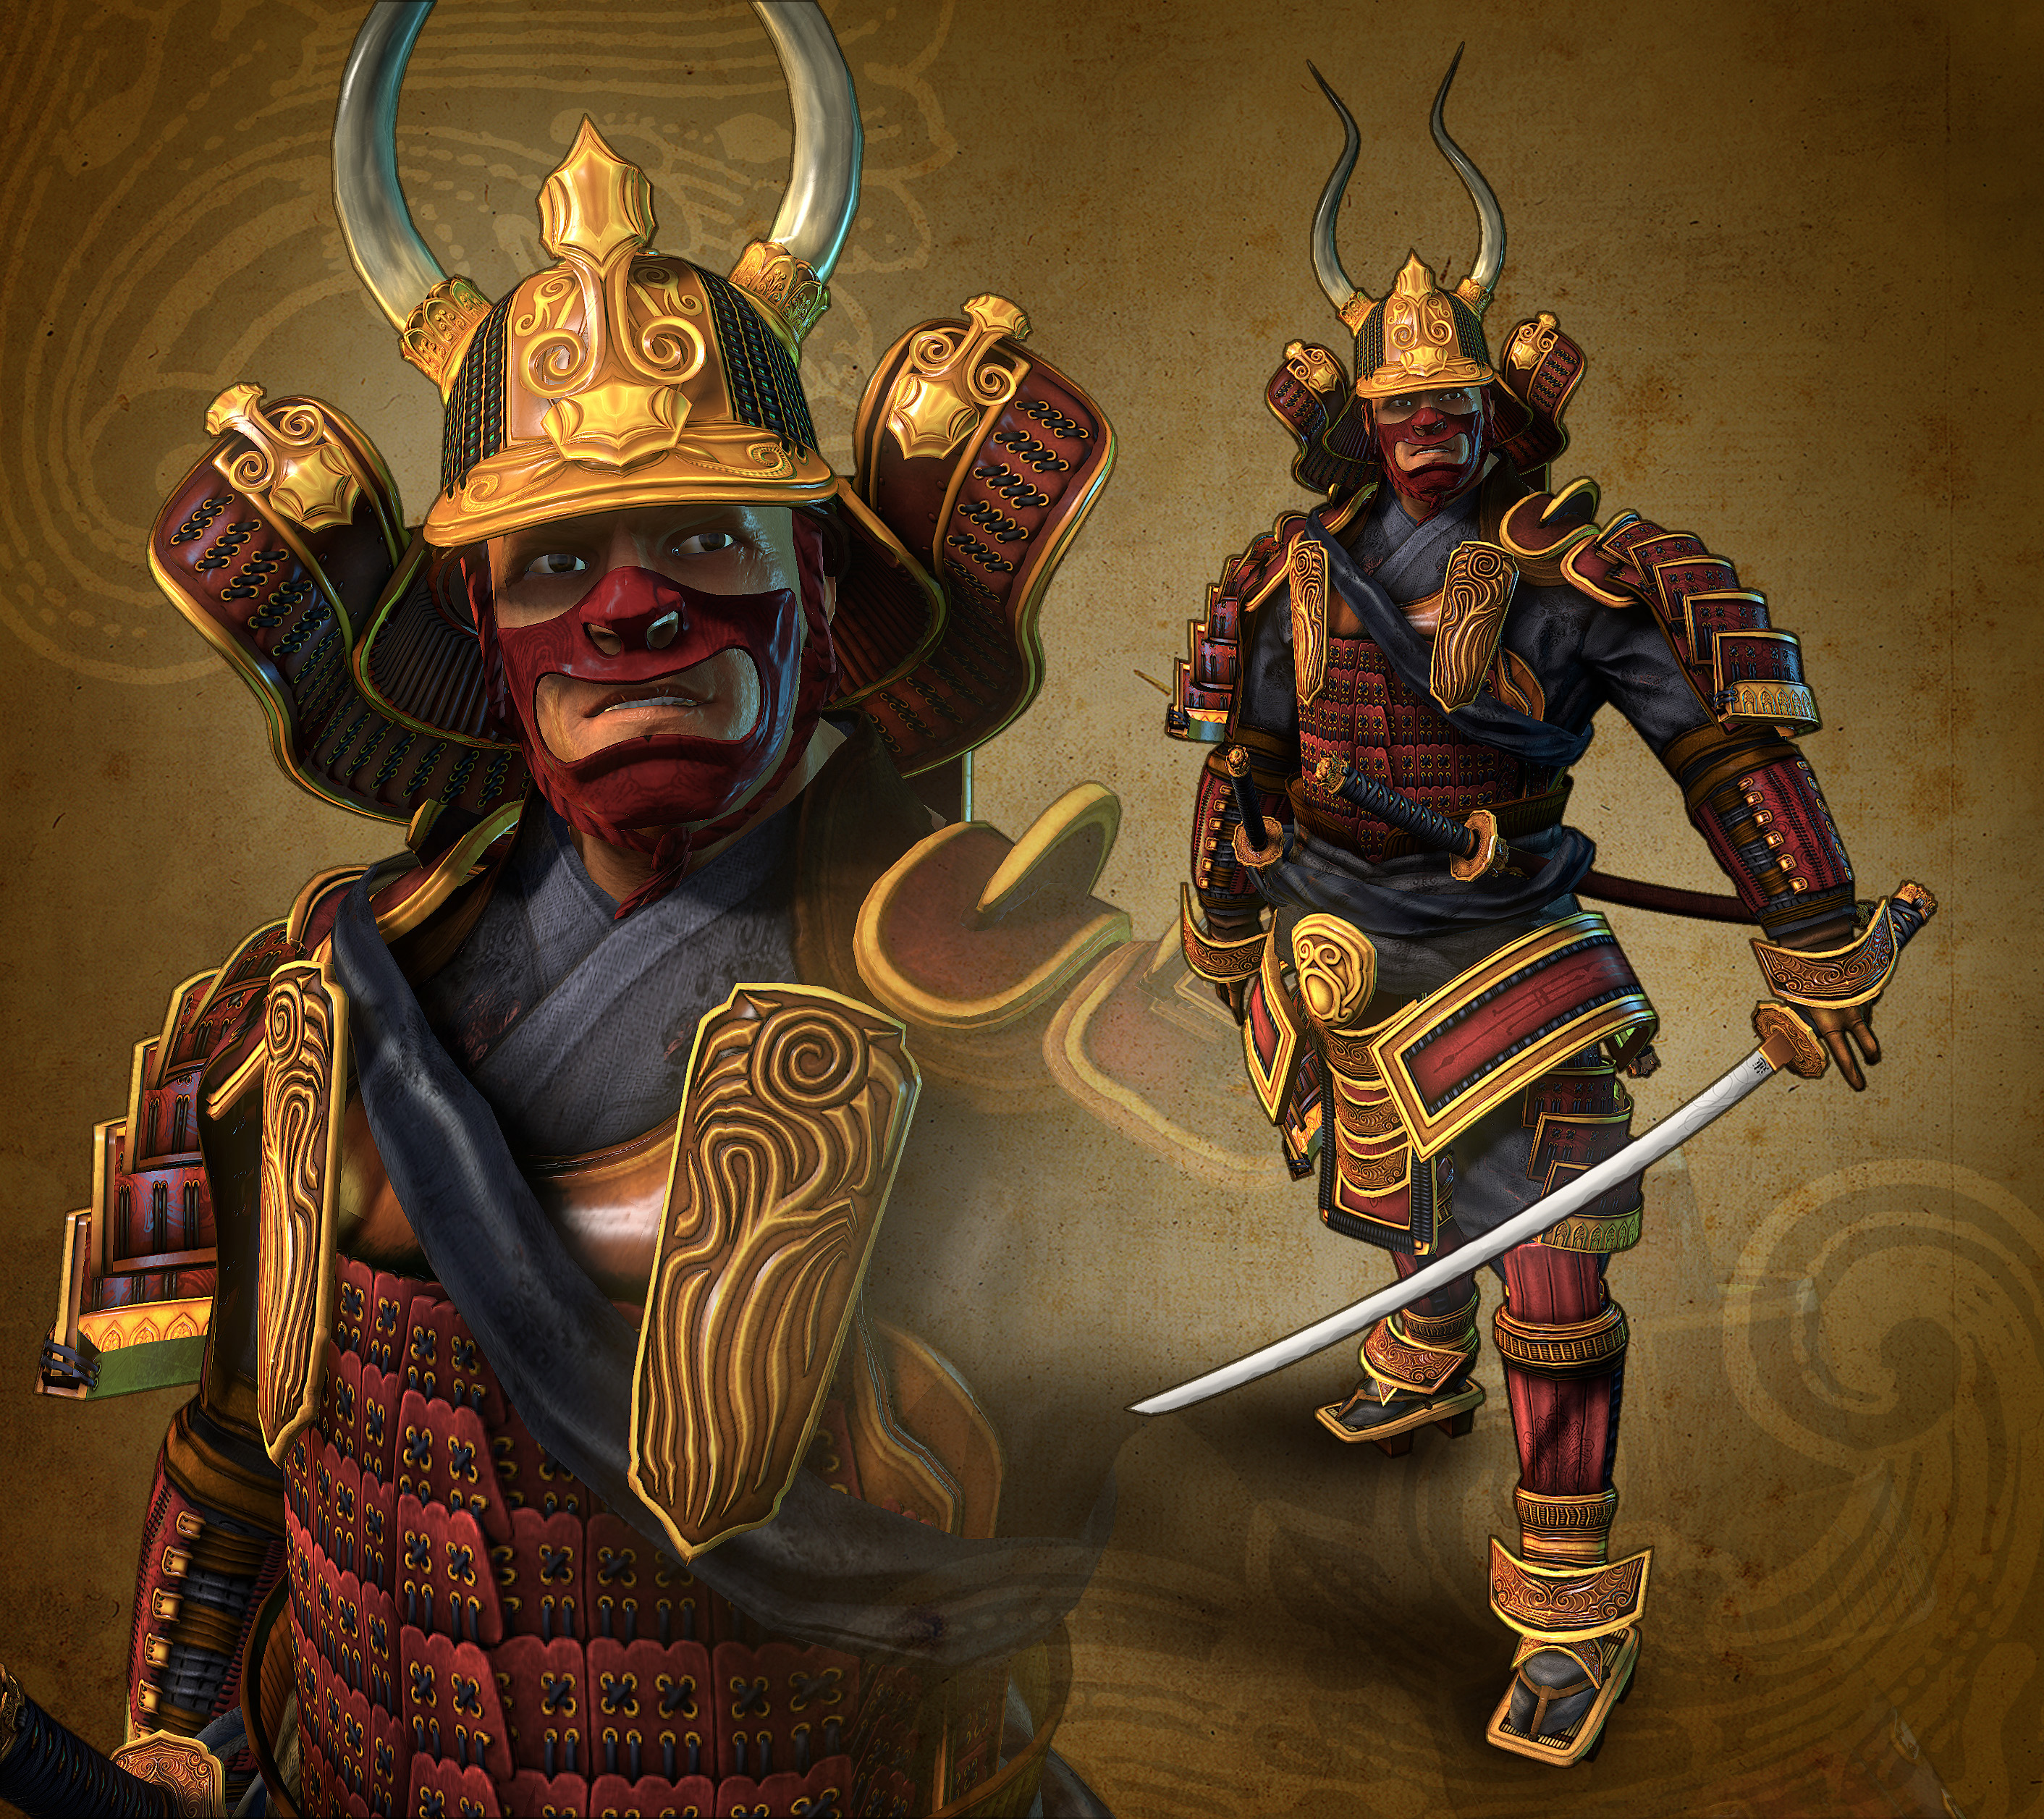 lotus samurai jackson robinson 3d 2d artist aka onelunglewis